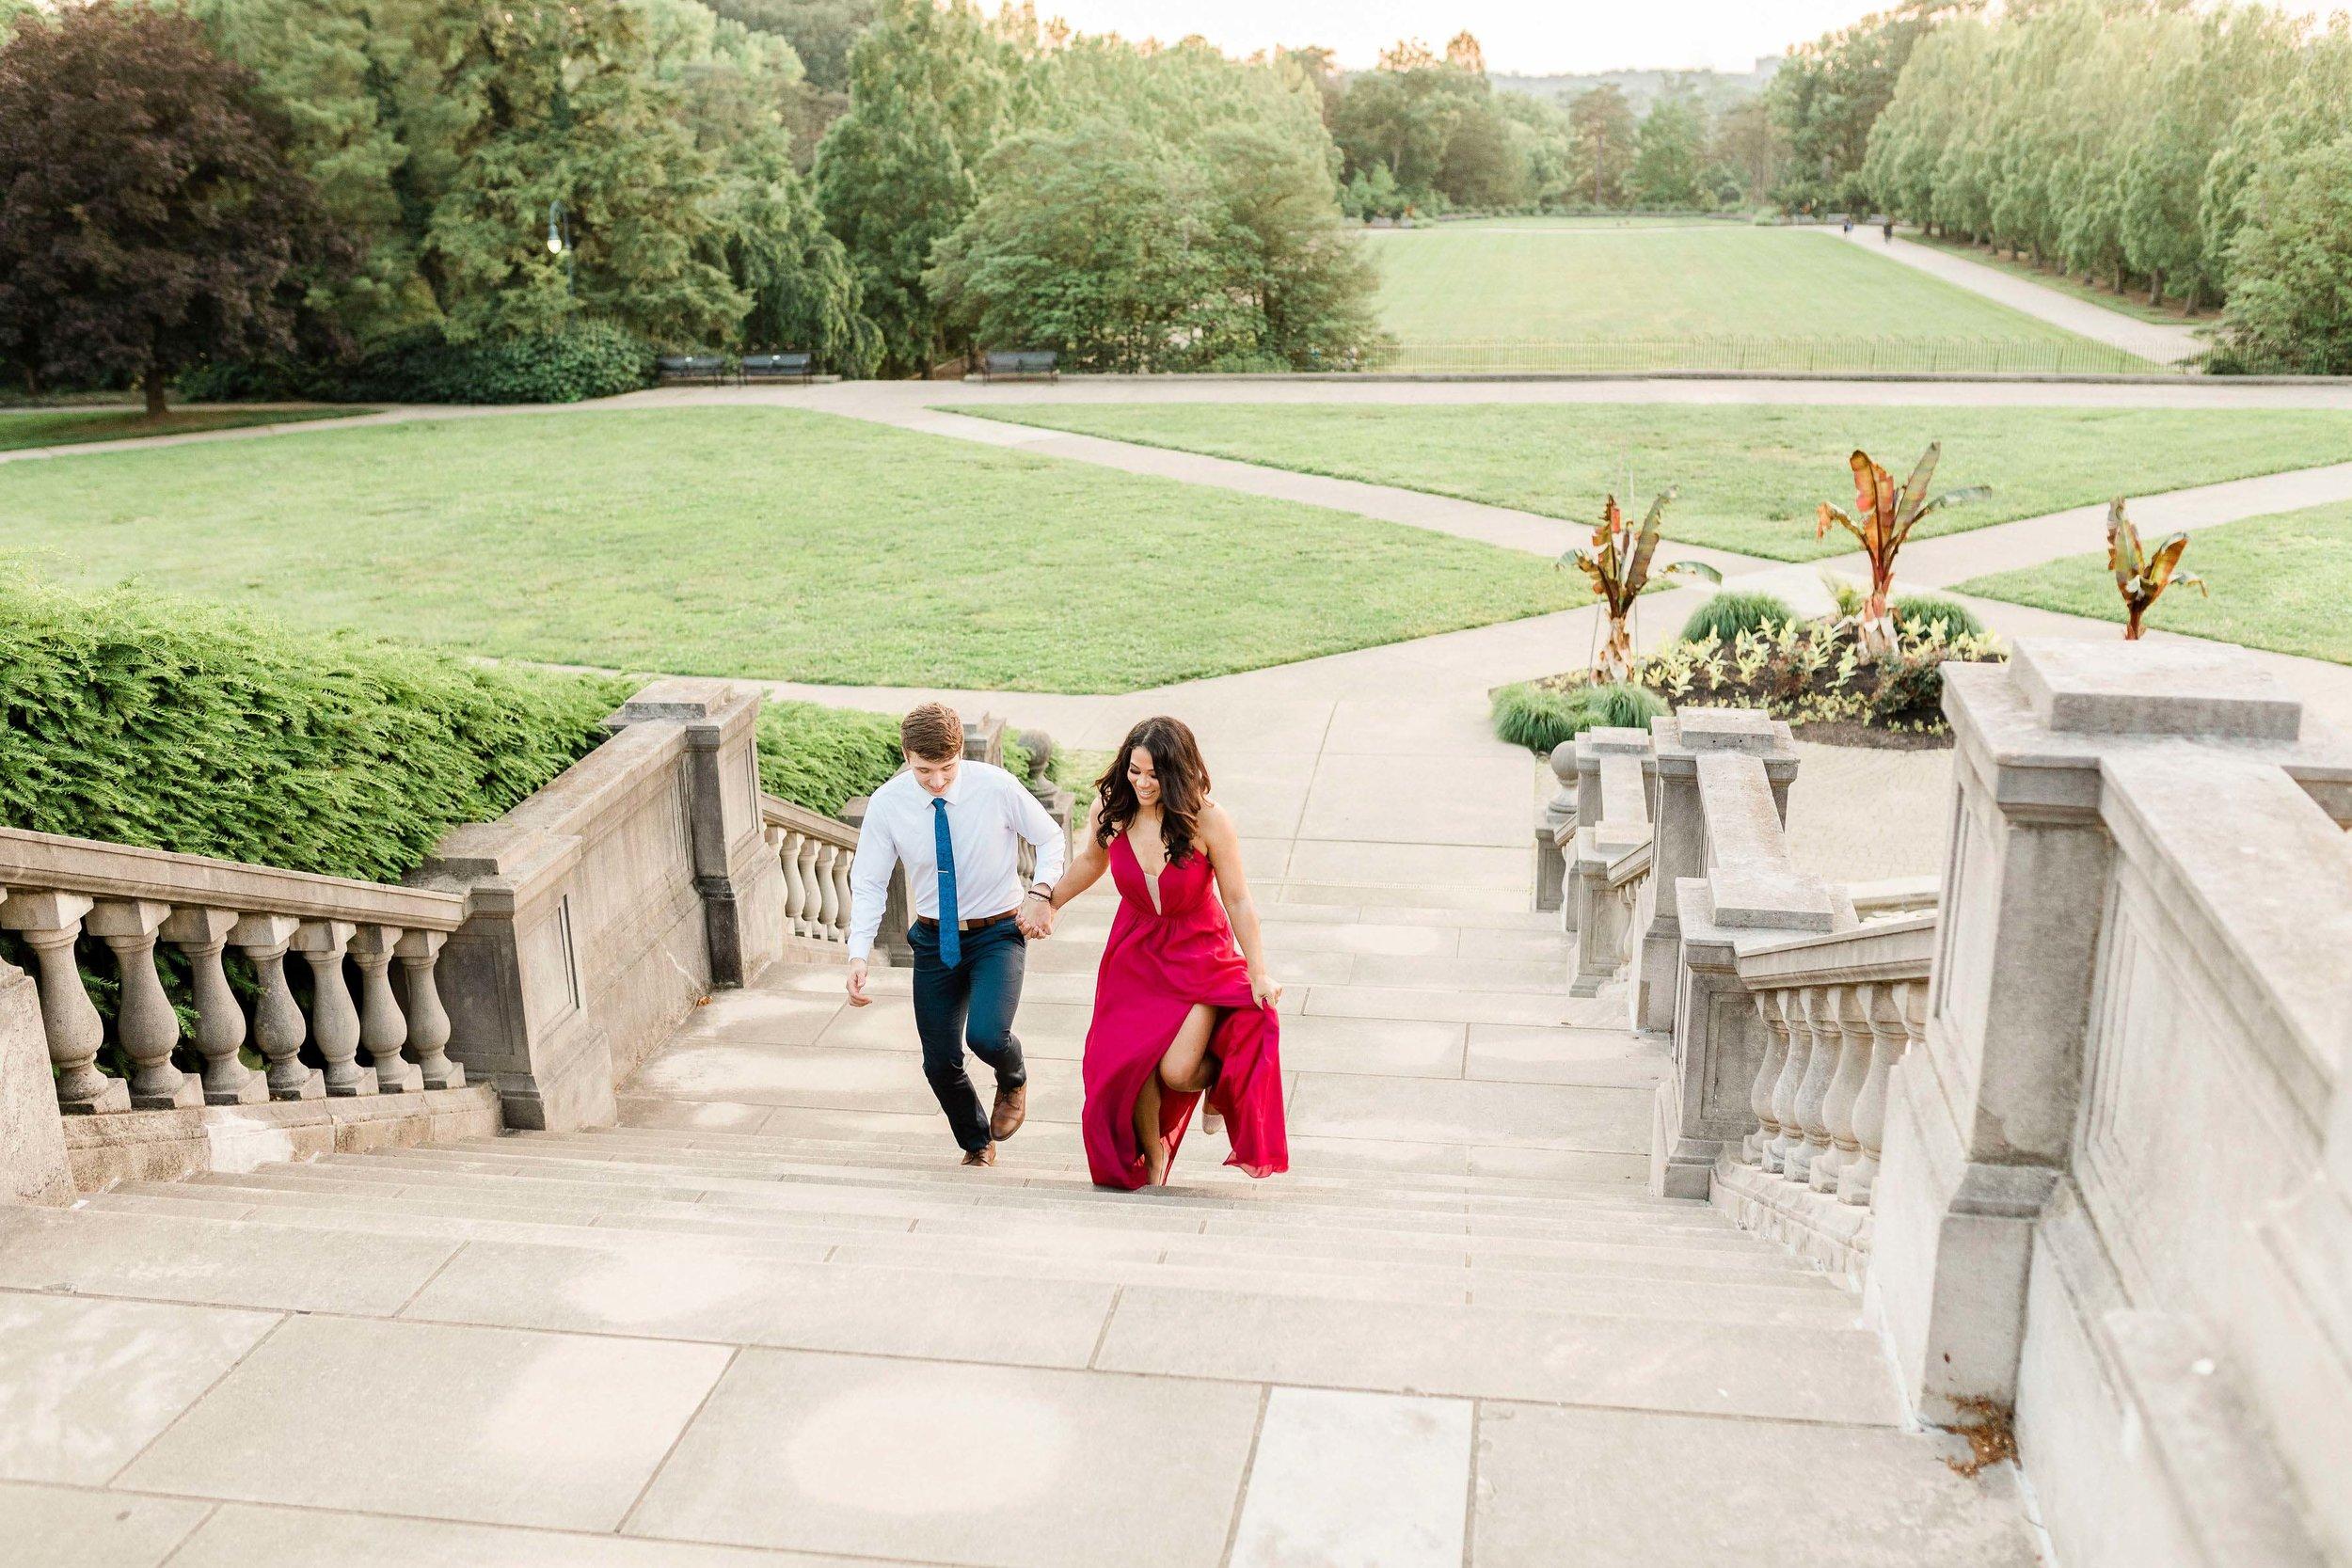 cincinnati dayton ohio engagement wedding photographers-10.jpg